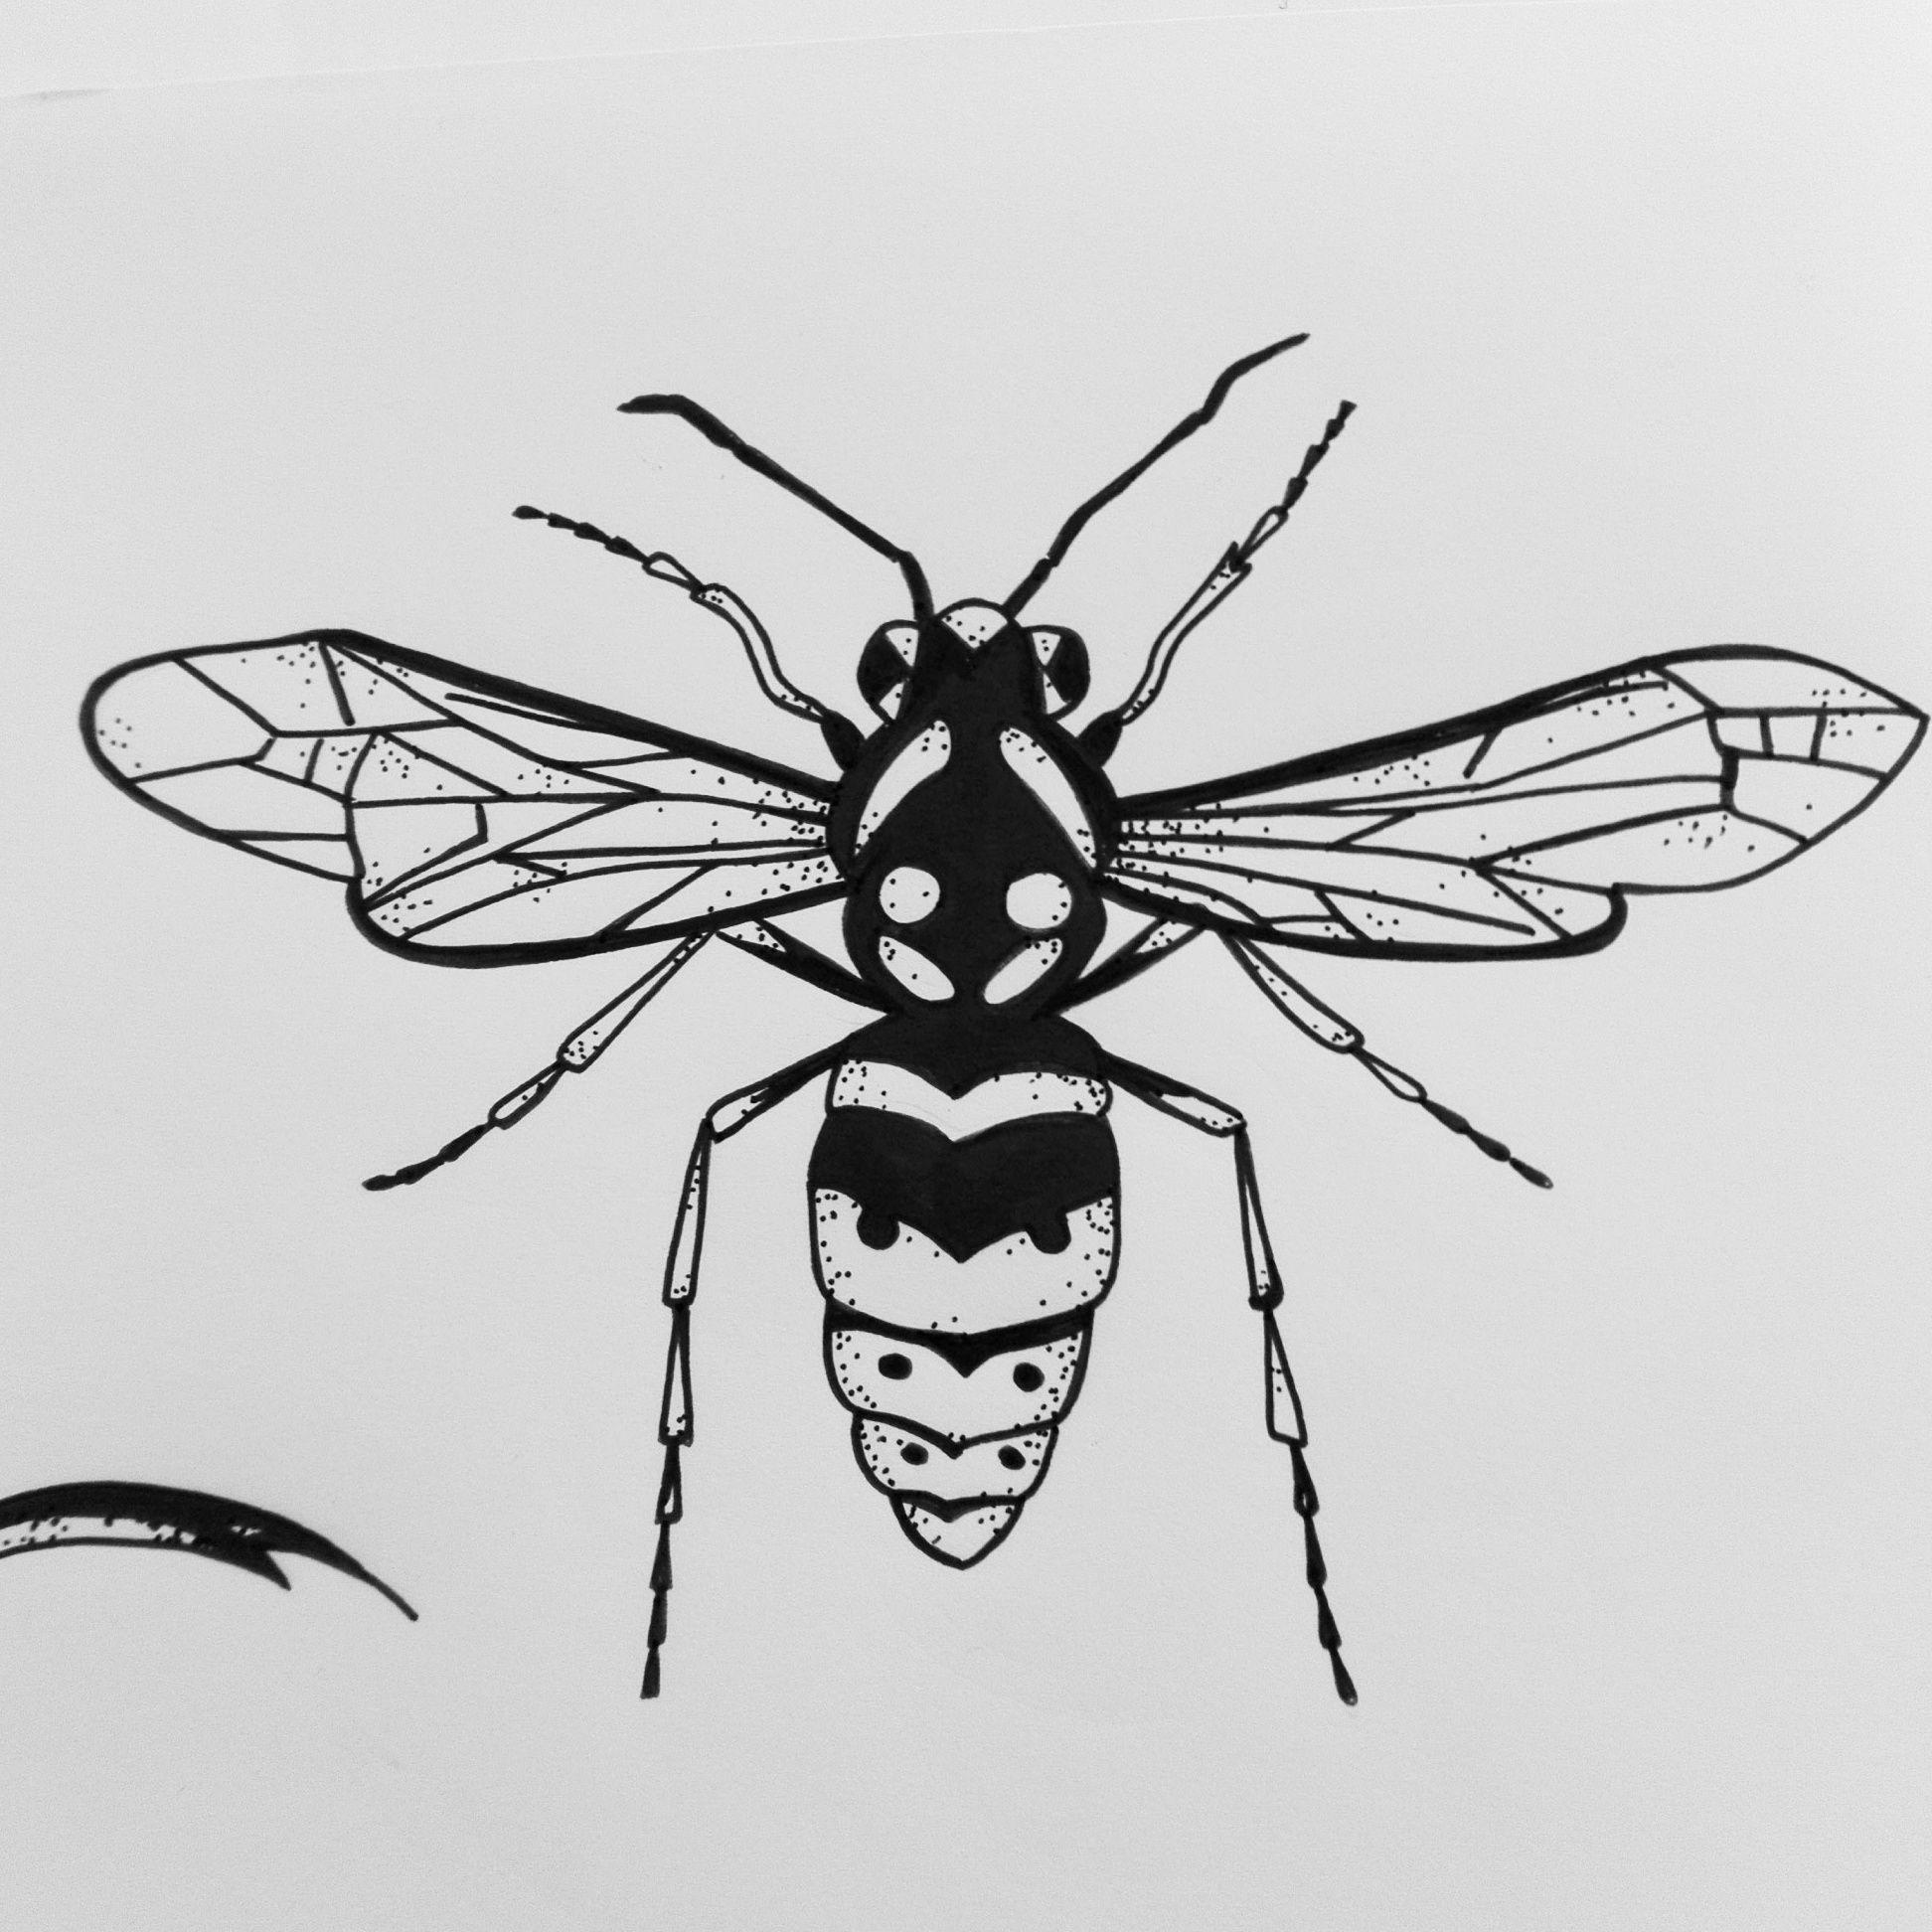 Dispo Pour Tattoo Spirartgraphique Artnblinetattoo Plaisancedutouch Flashtattoo Wasp Wasp Tattoo Drawings Wasp